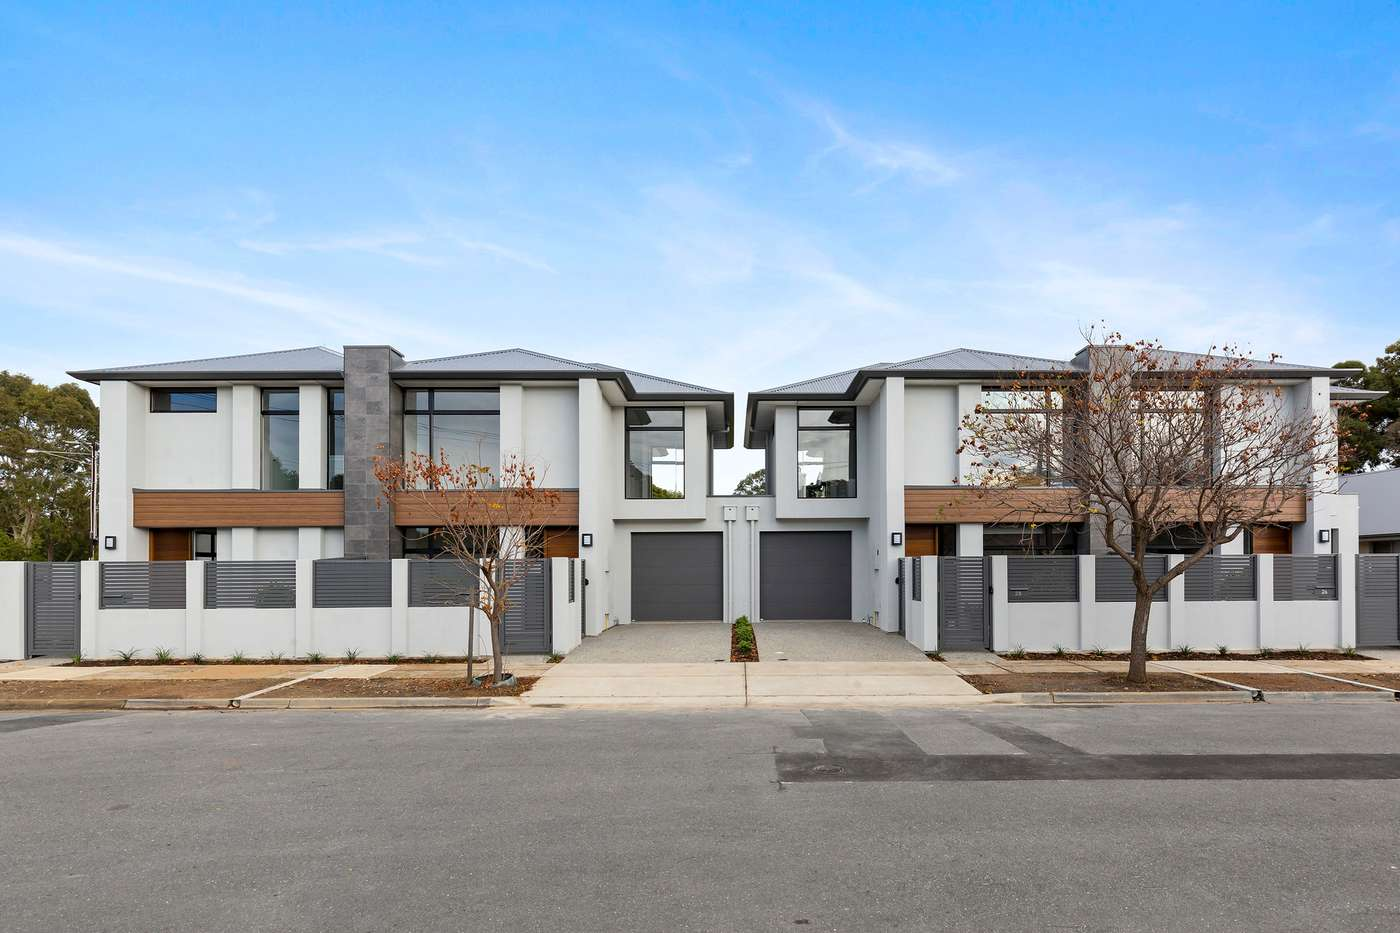 Main view of Homely house listing, 26 Charles Street, Plympton, SA 5038